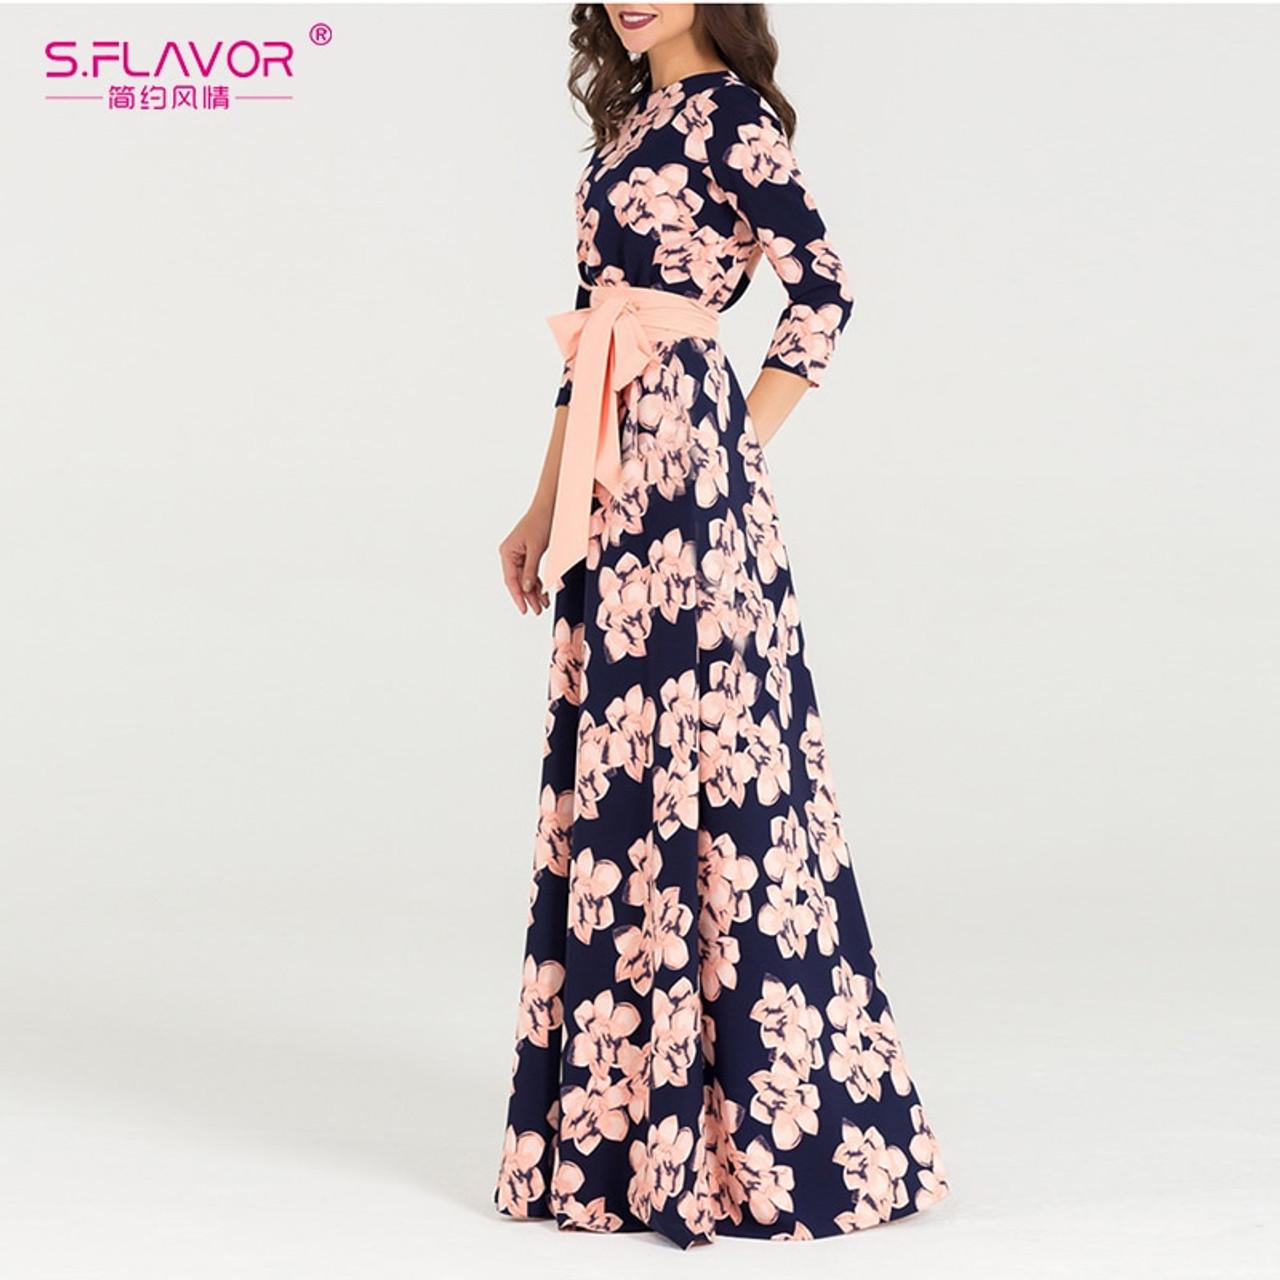 c42ce226b16 ... S.FLAVOR Women printing autumn dress Elegant O-neck loose style long  party dress ...